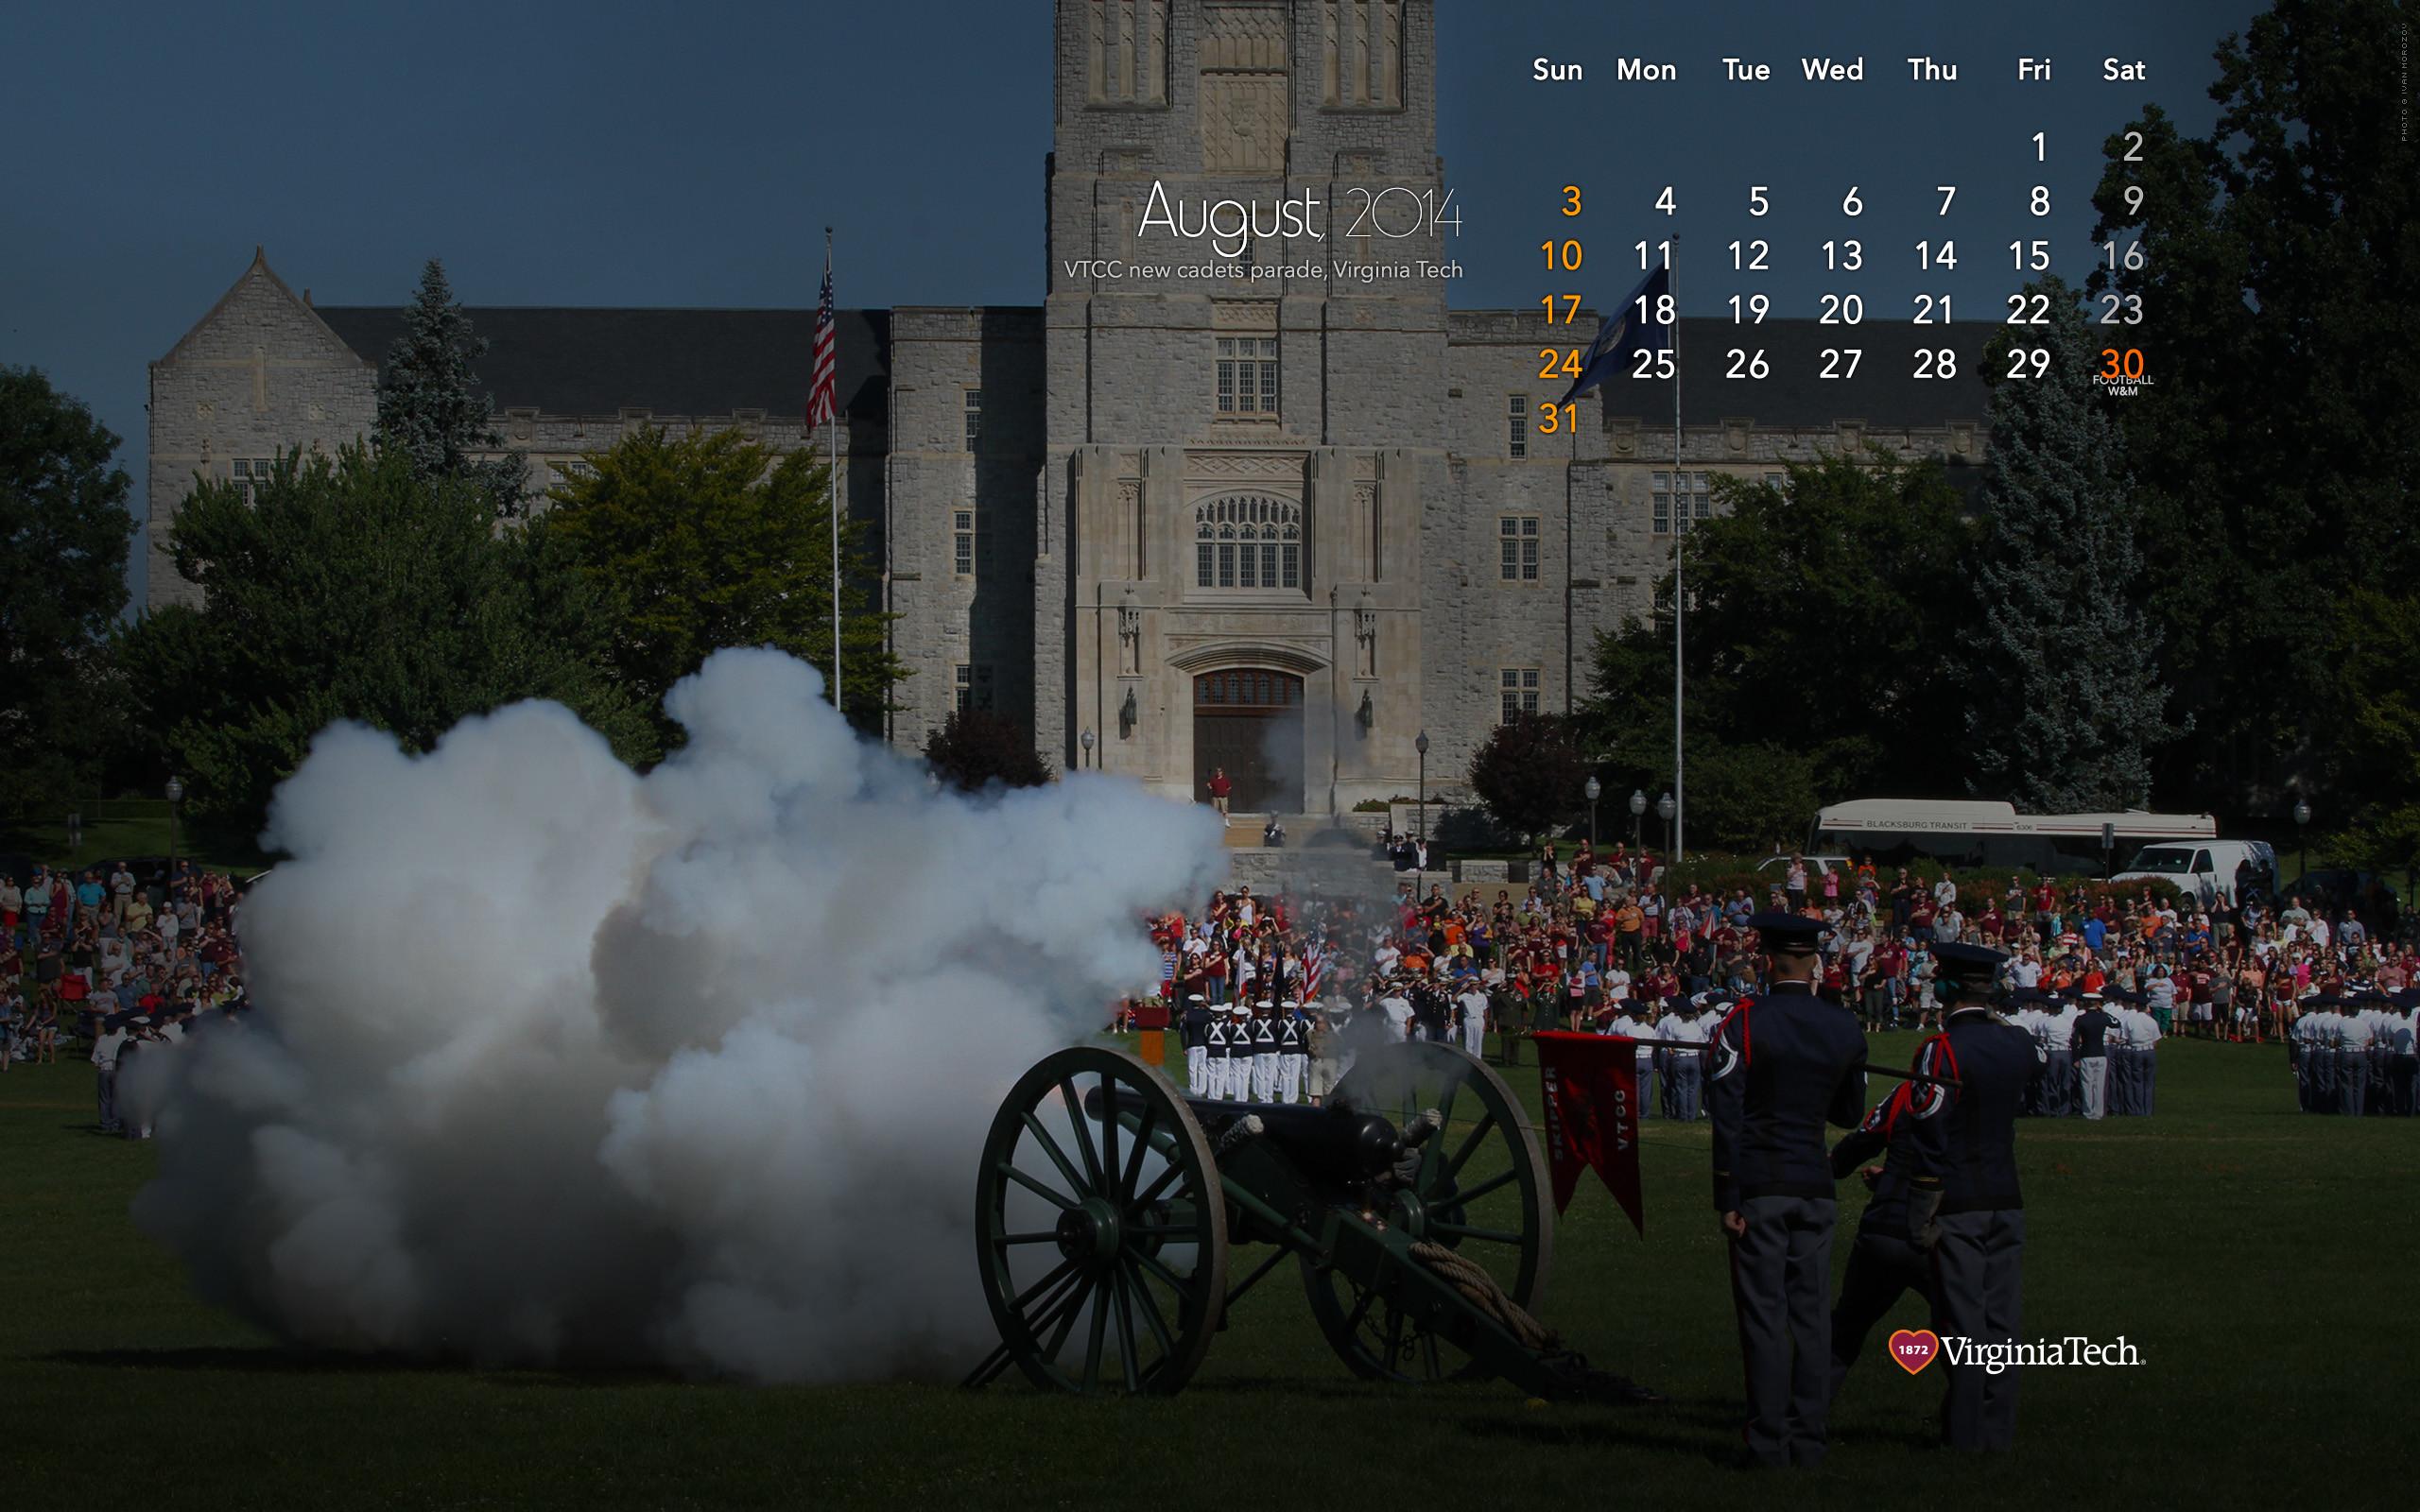 Virginia Tech. Download: 2560 x 1600 …